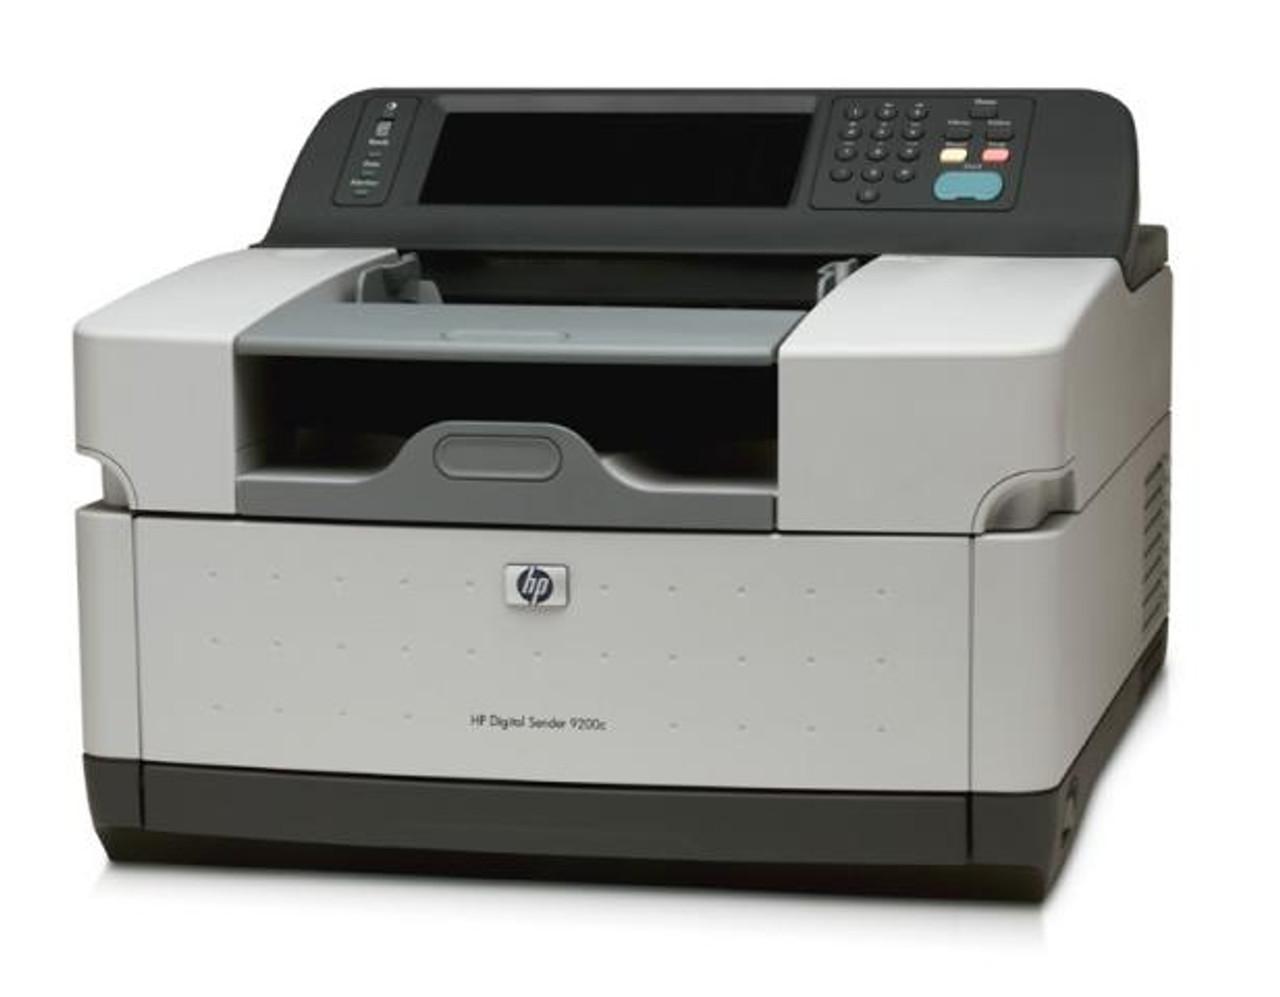 HP Digital Sender 9200C - 600 dpi x 600 dpi- Document scanner